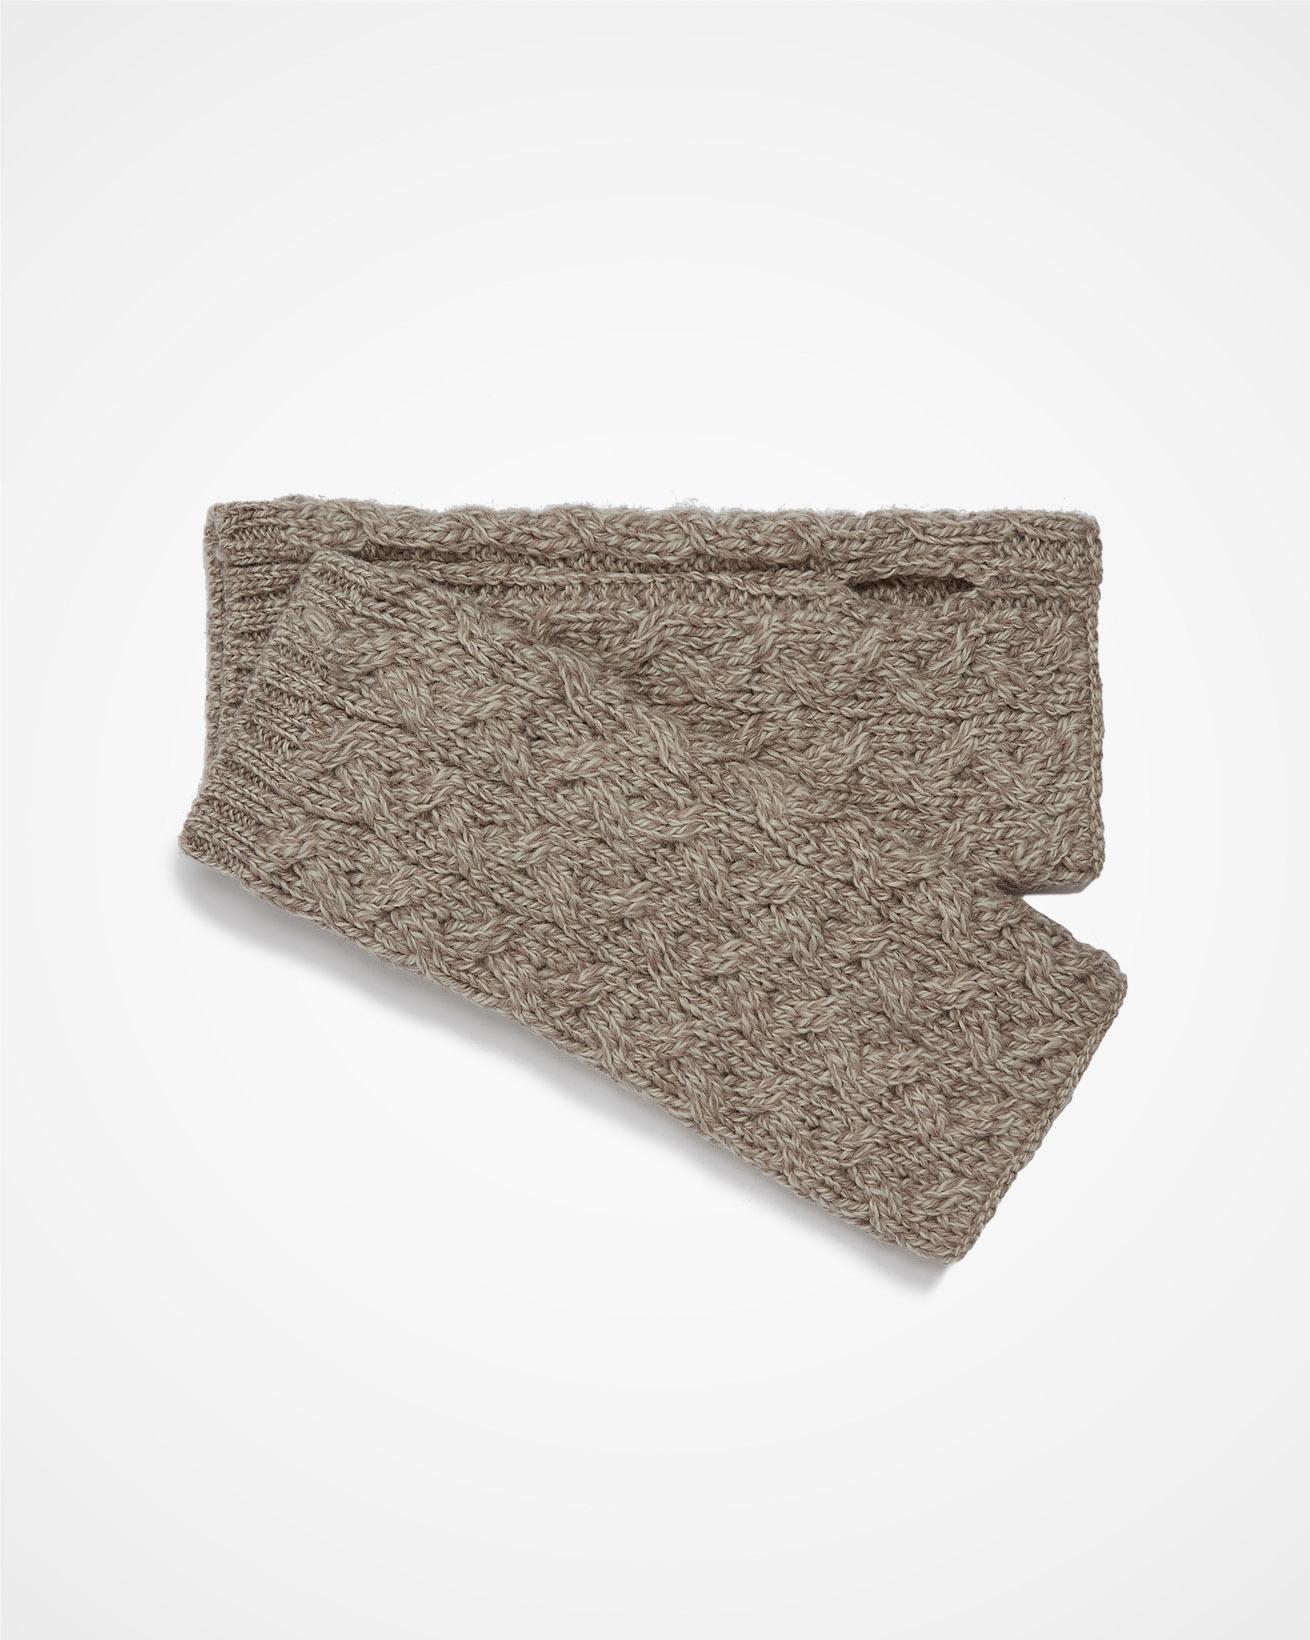 7660_aran-cable-fingerless-mitts_oatmeal-fleck_1_cutout_web.jpg